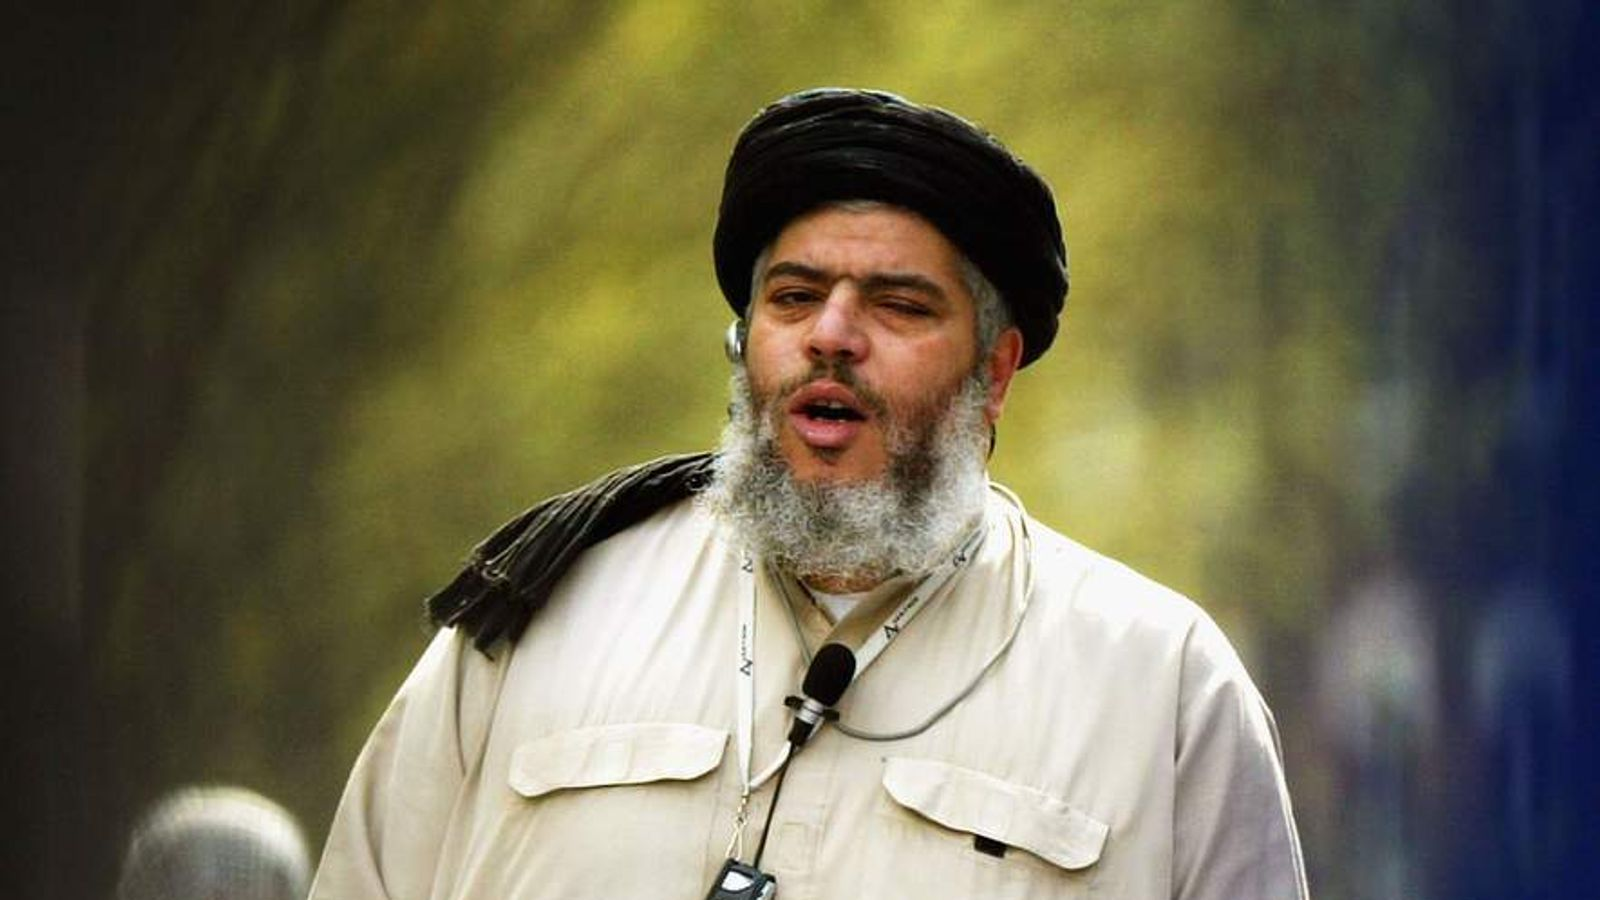 Radical Cleric Abu Hamza Preaching